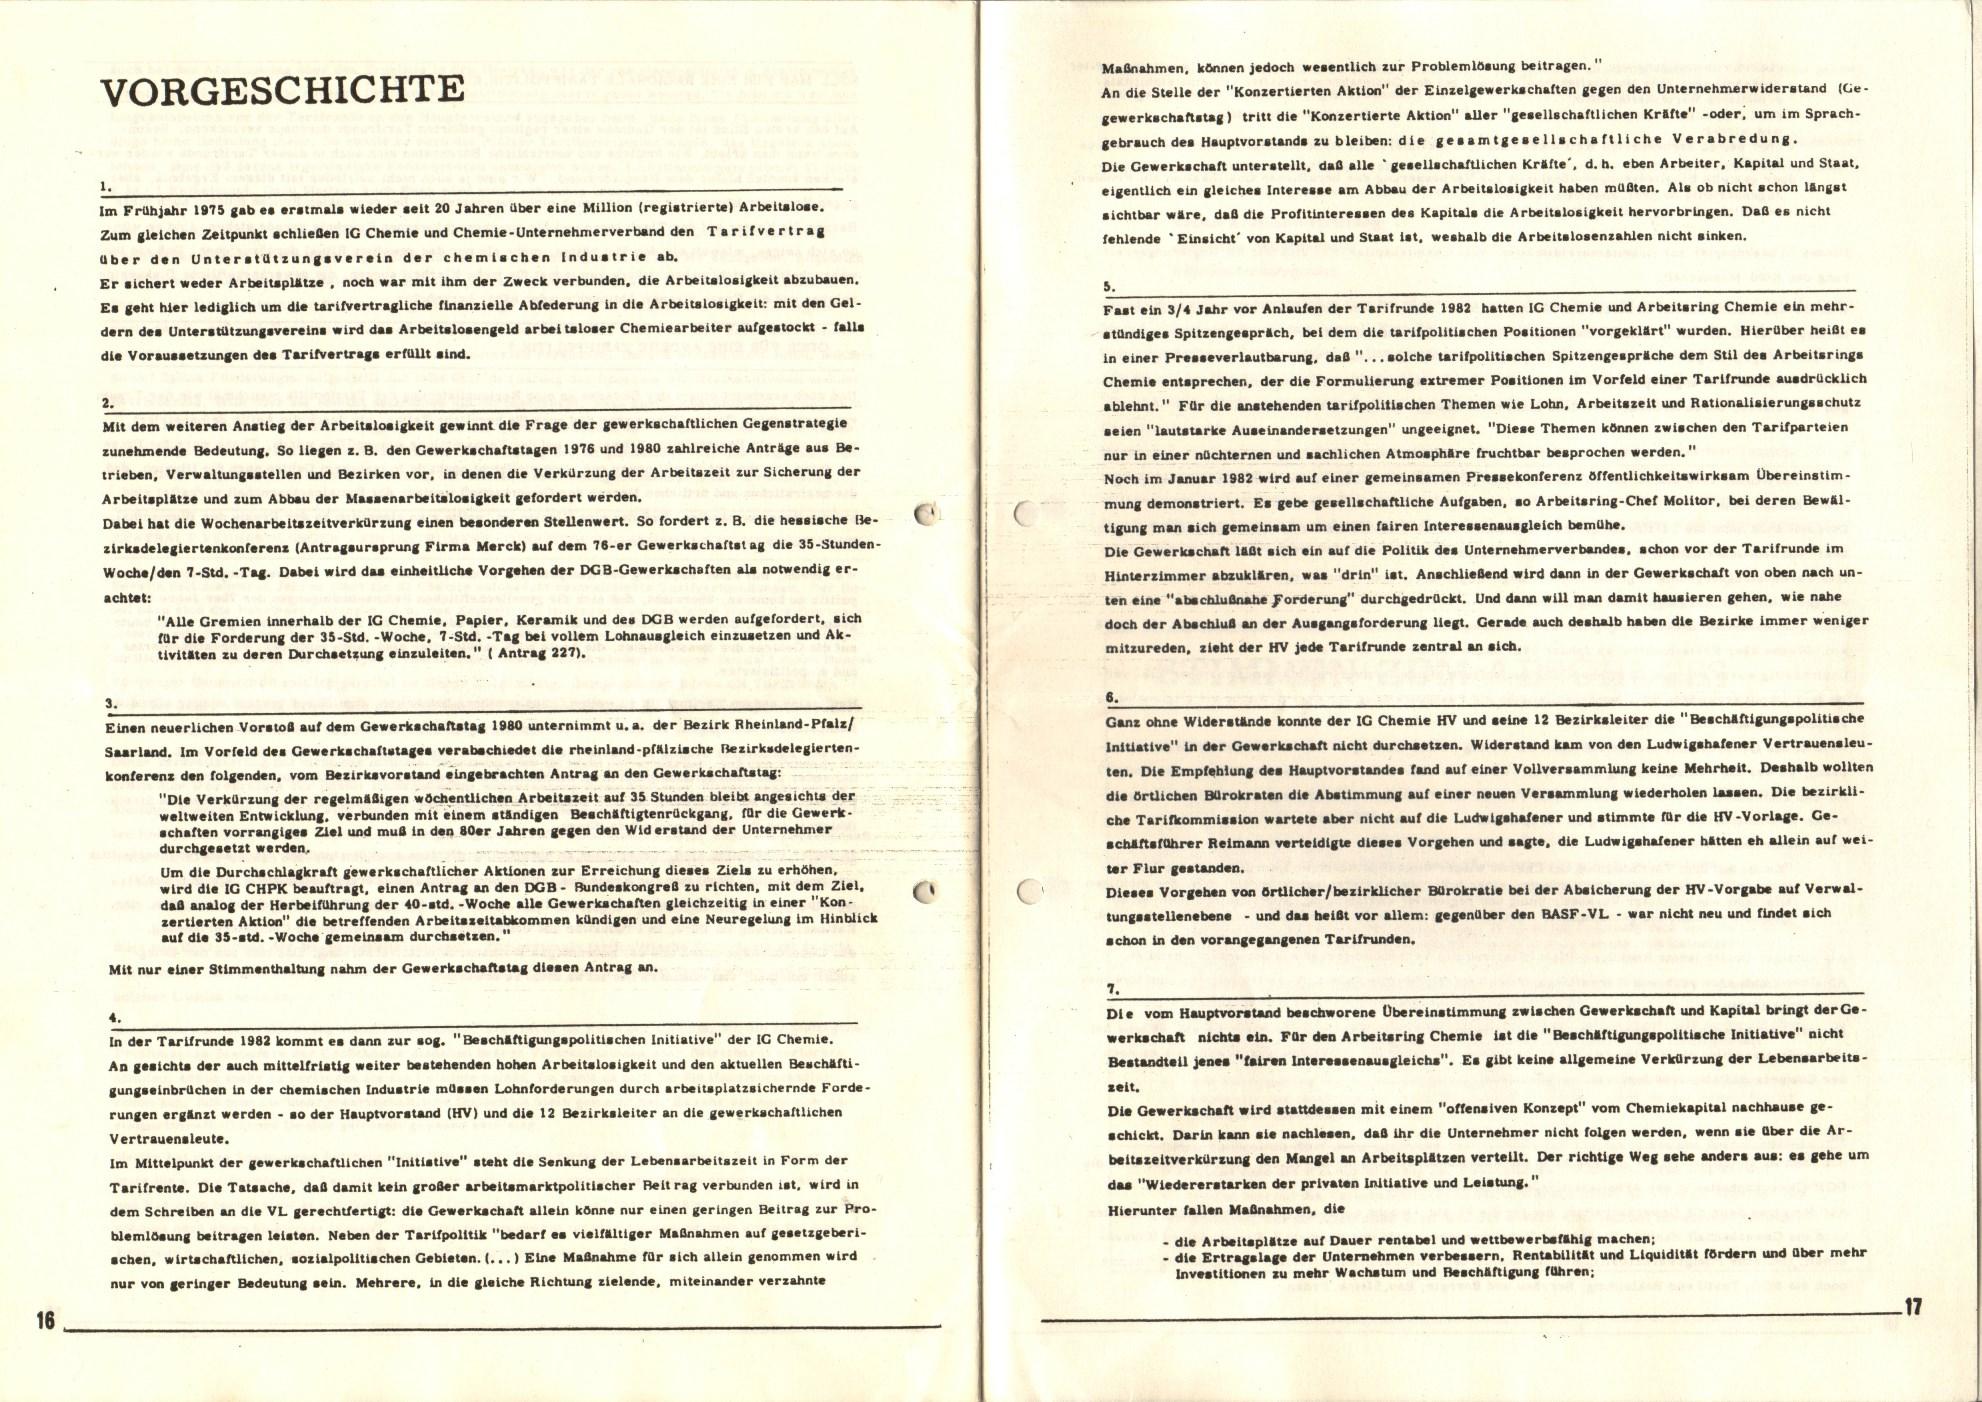 Ludwigshafen_BASF_Chemie_Tarifrunde_1985_09